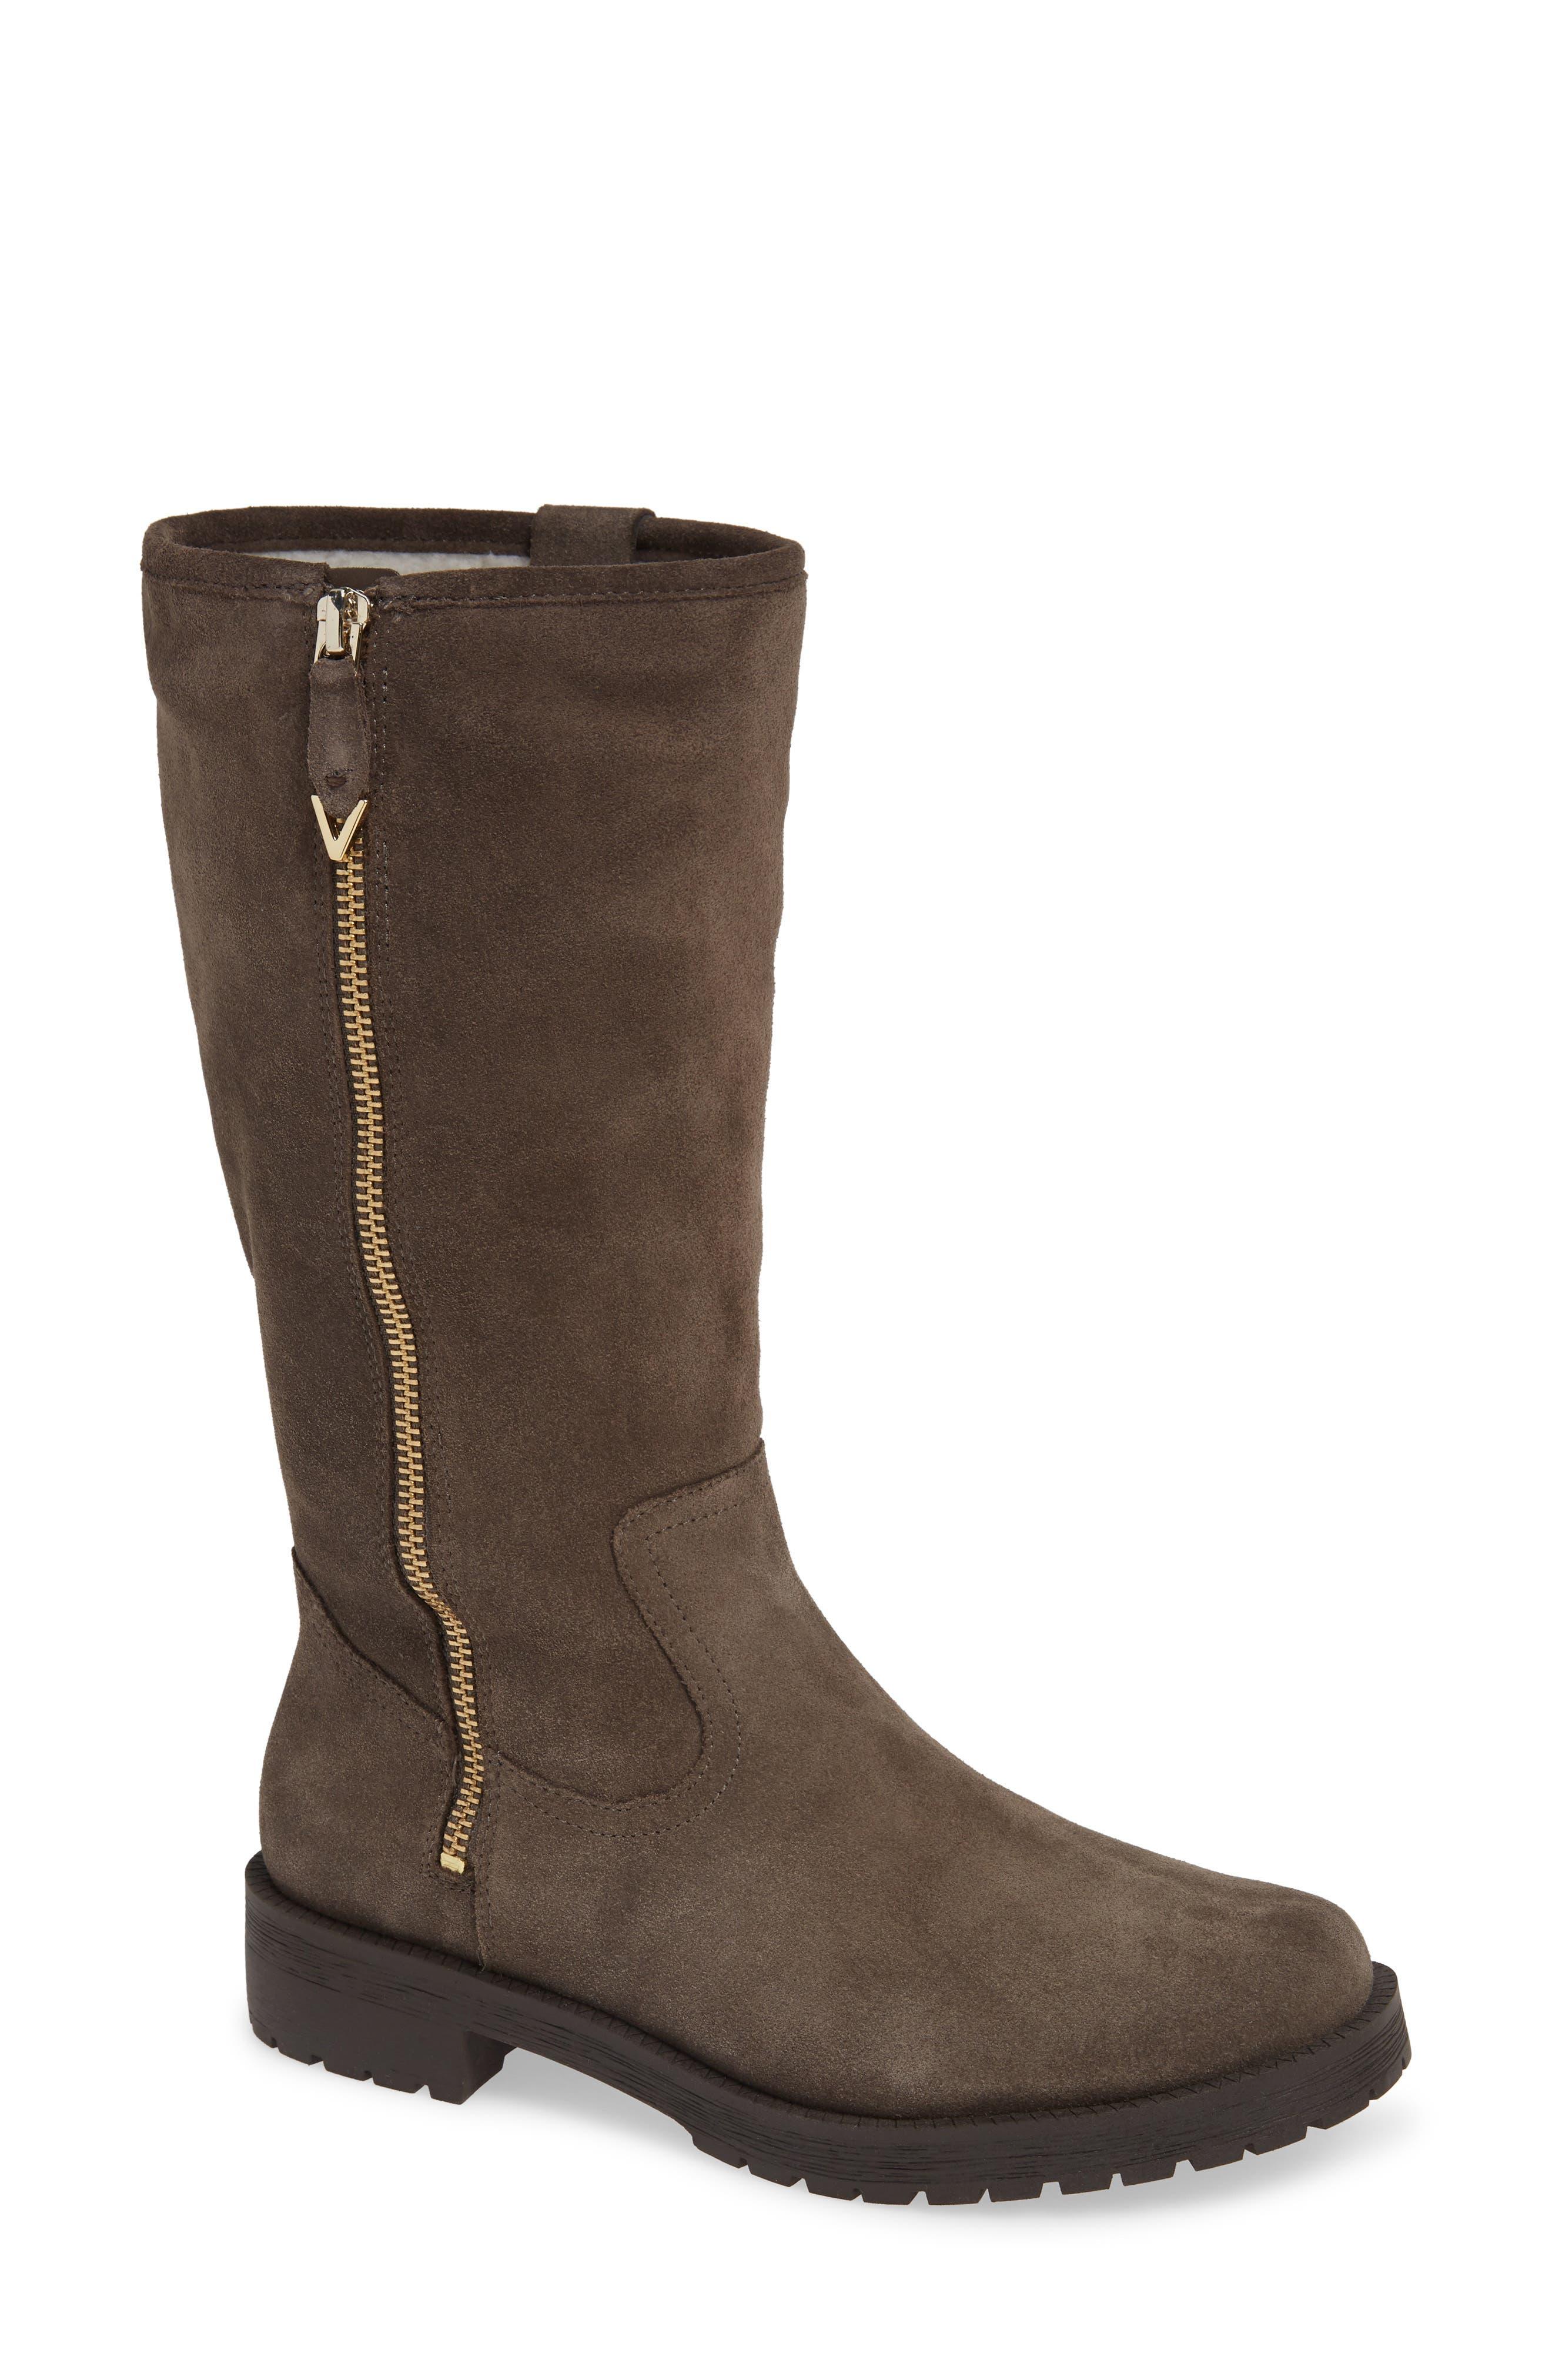 Vionic Mica Boot, Grey